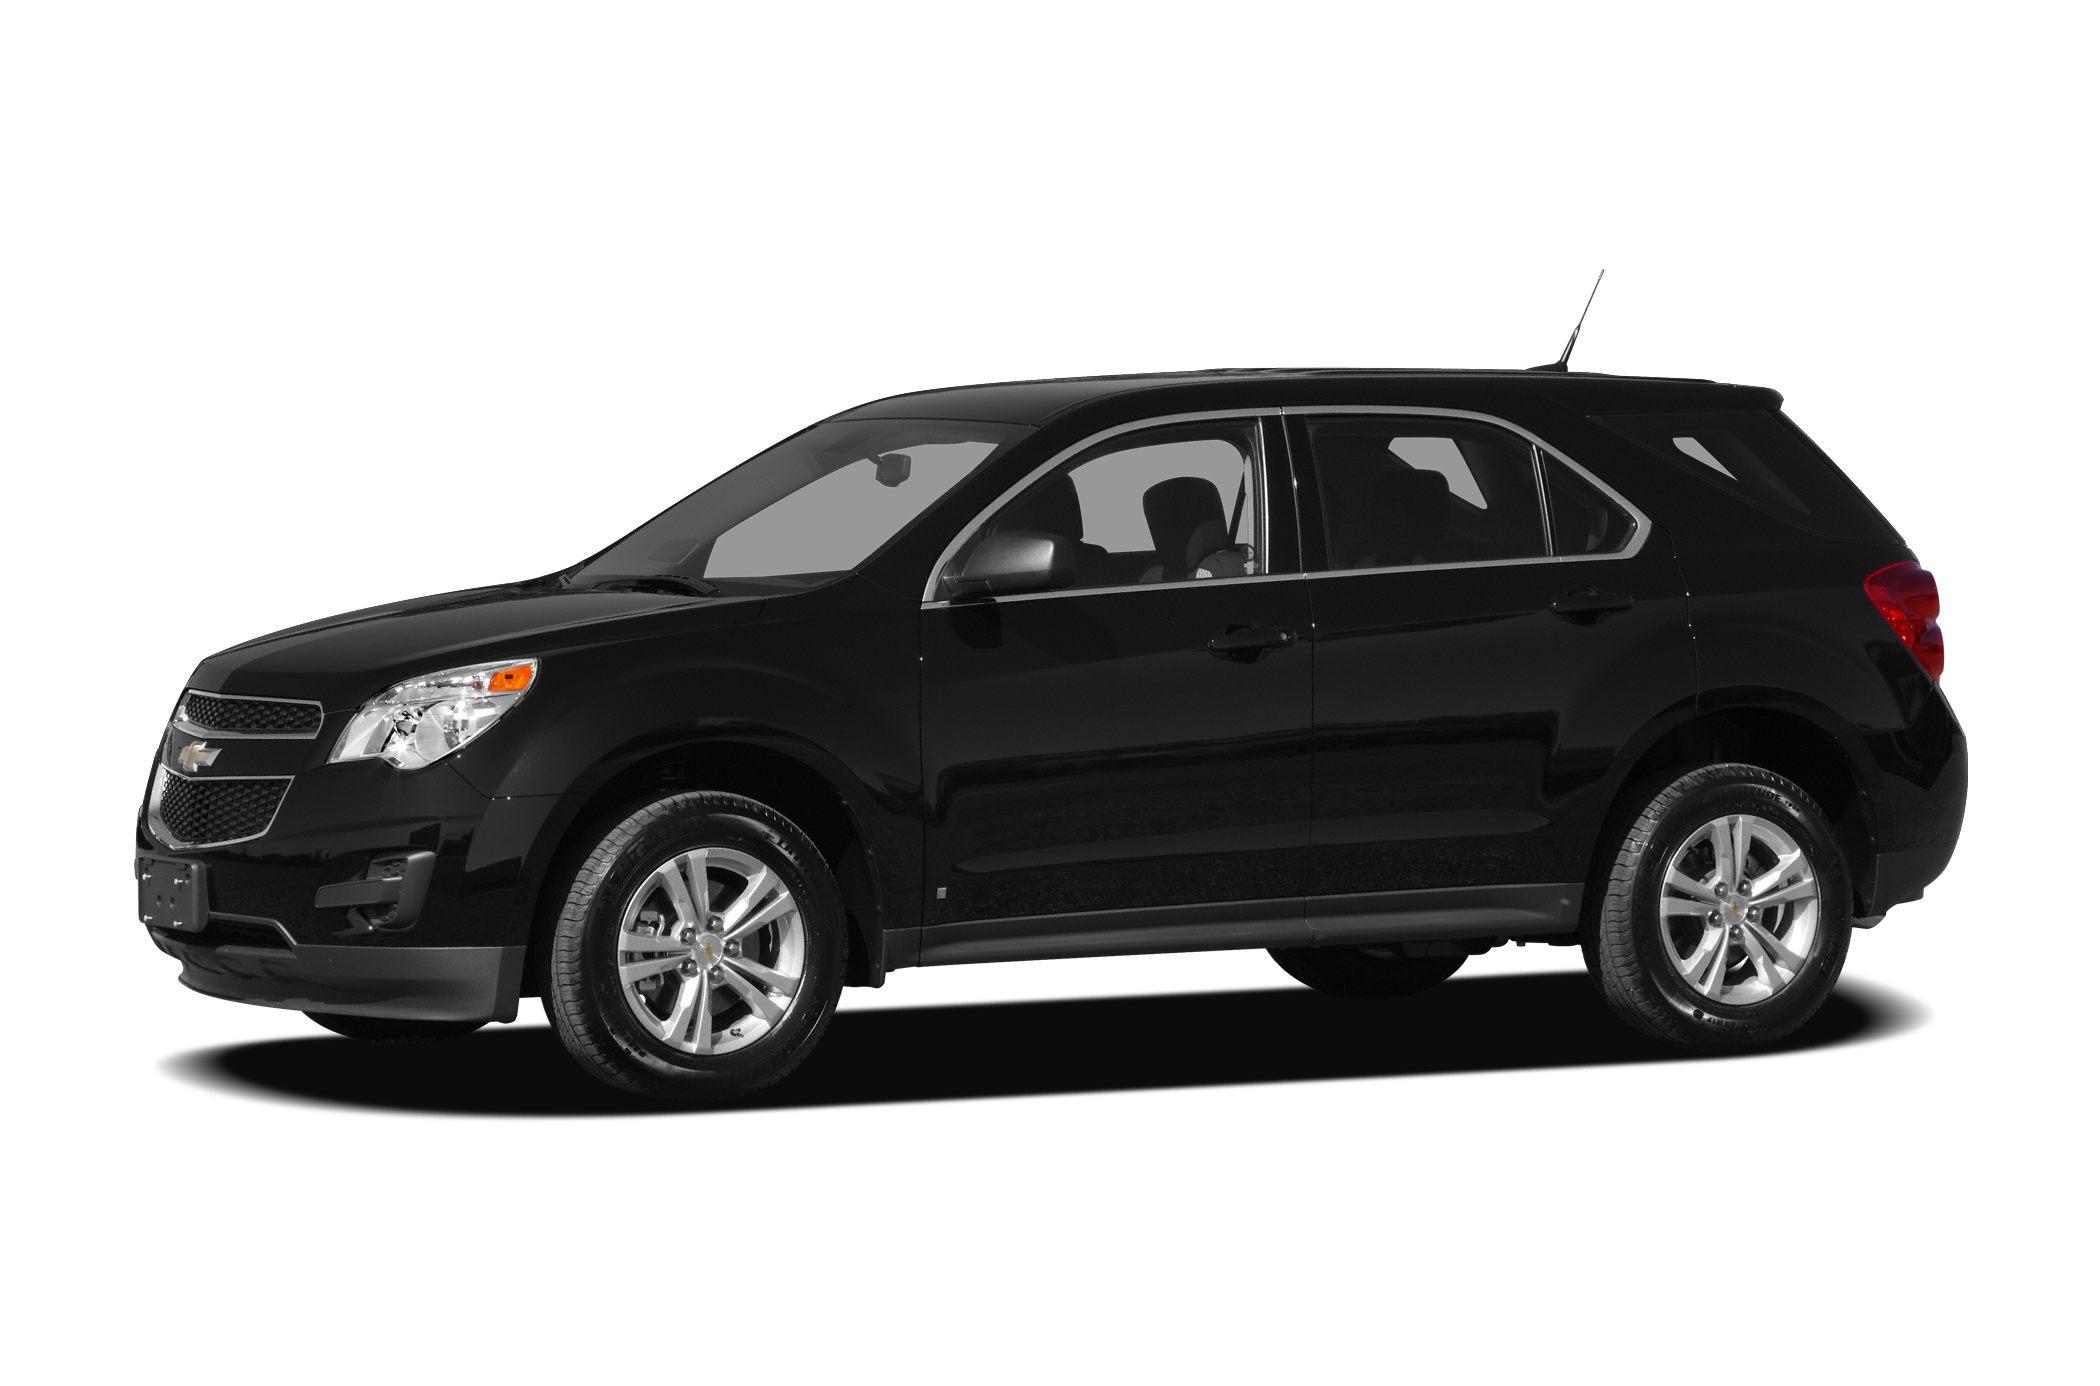 2011 Chevrolet Equinox LTZ Miles 43231Color Brown Stock 3099A VIN 2CNFLGEC0B6388477